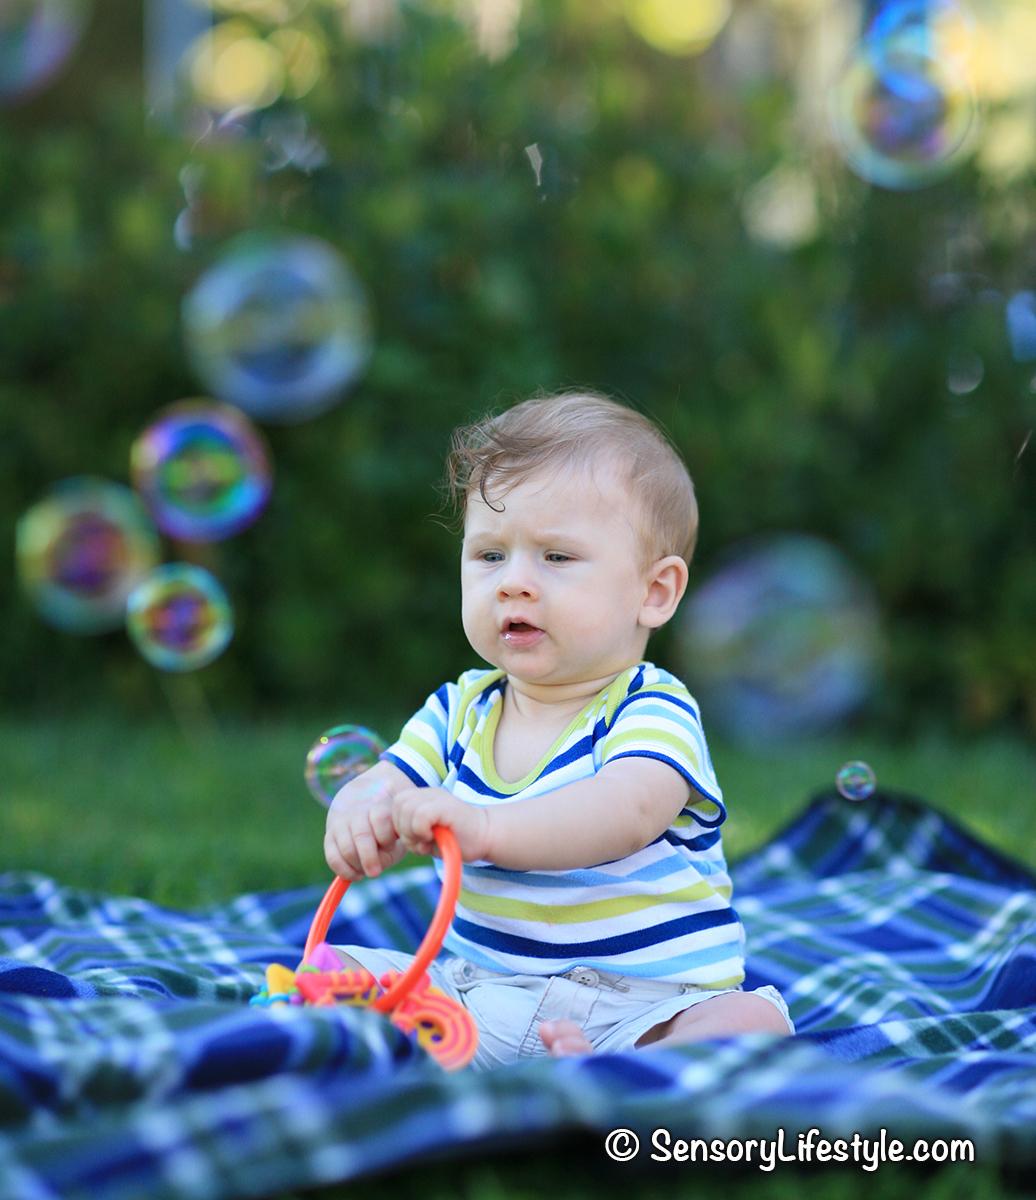 Tactile fun: Developmental benefits of bubbles